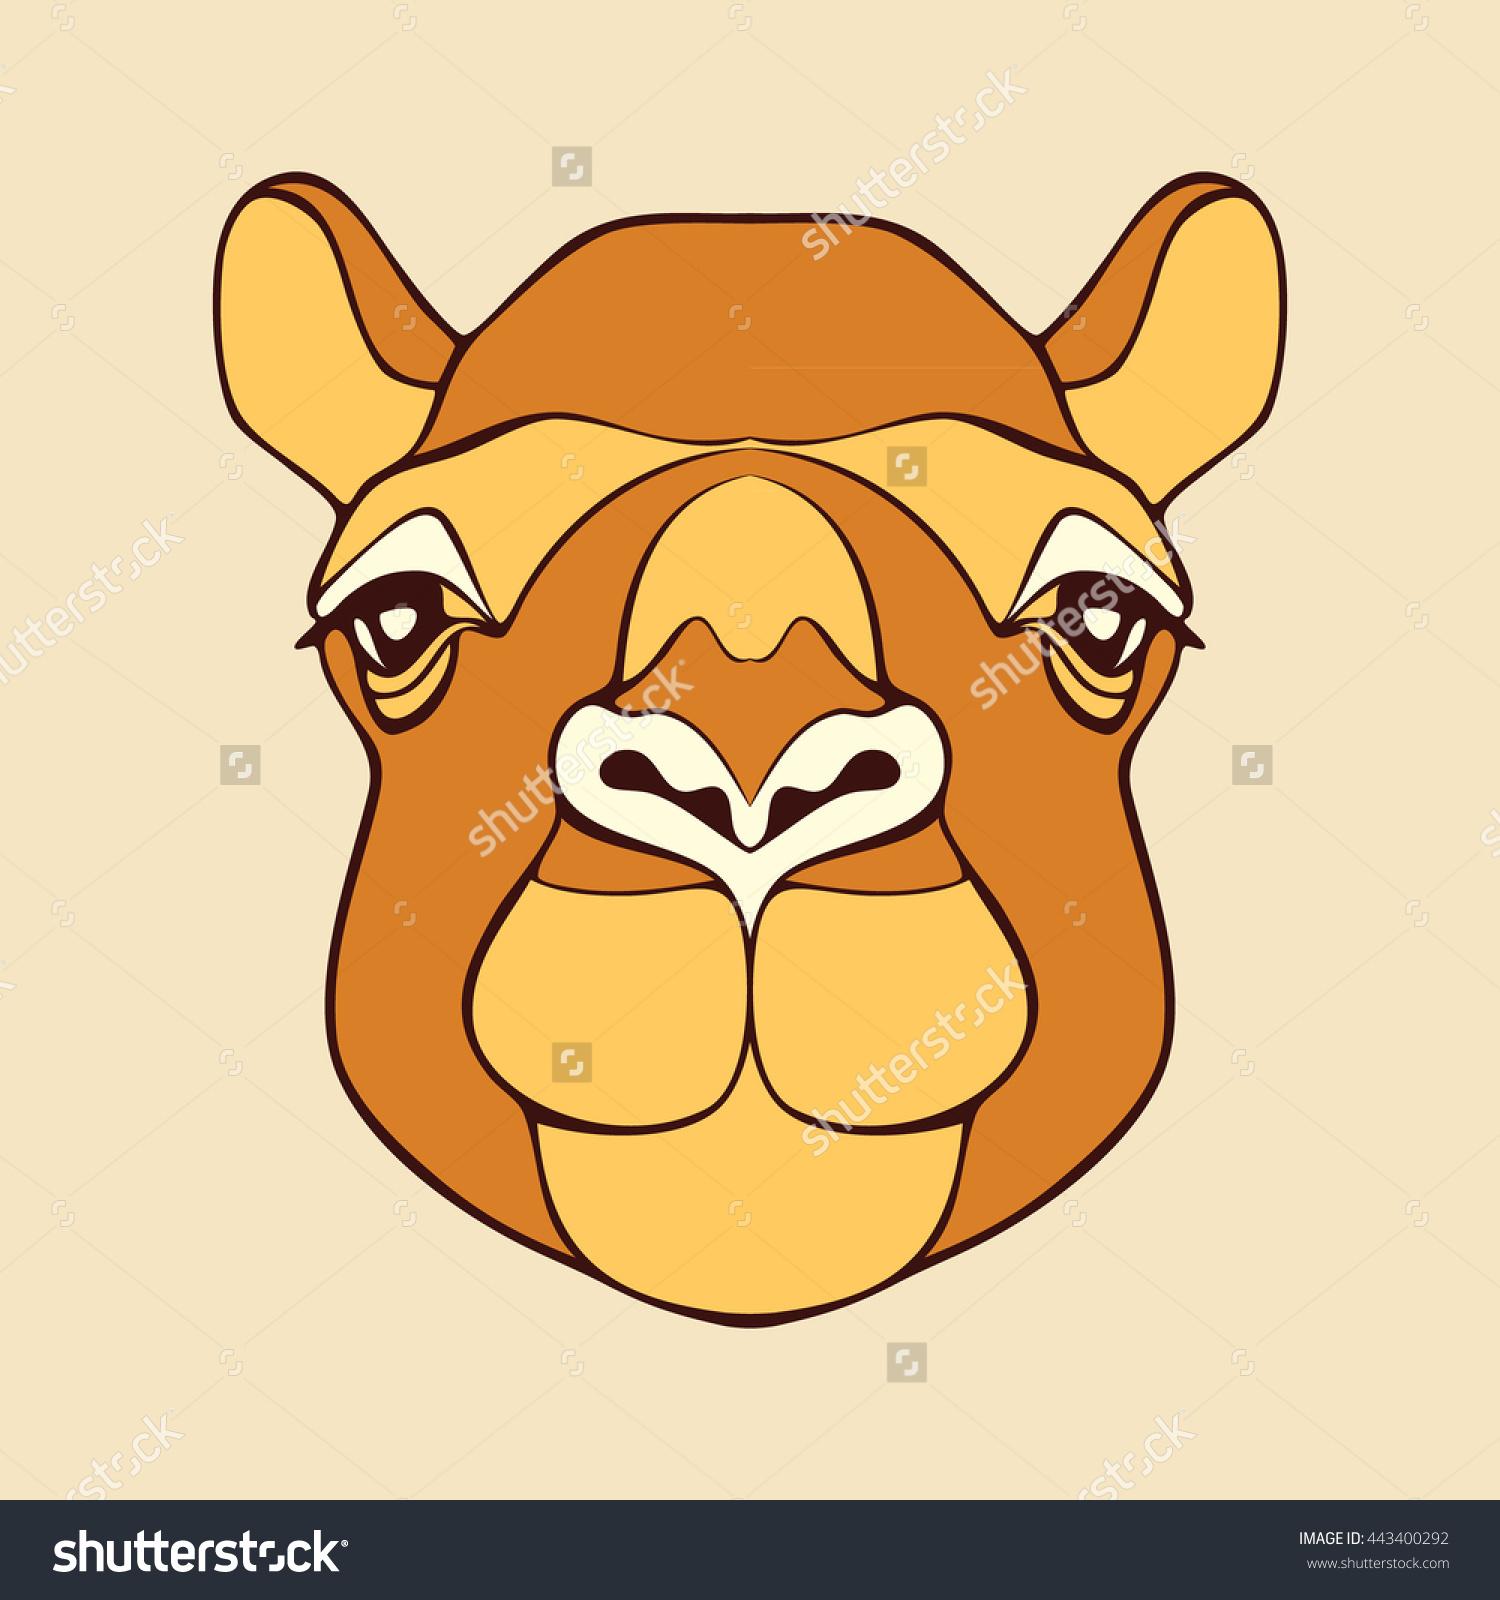 Camel head clipart #7